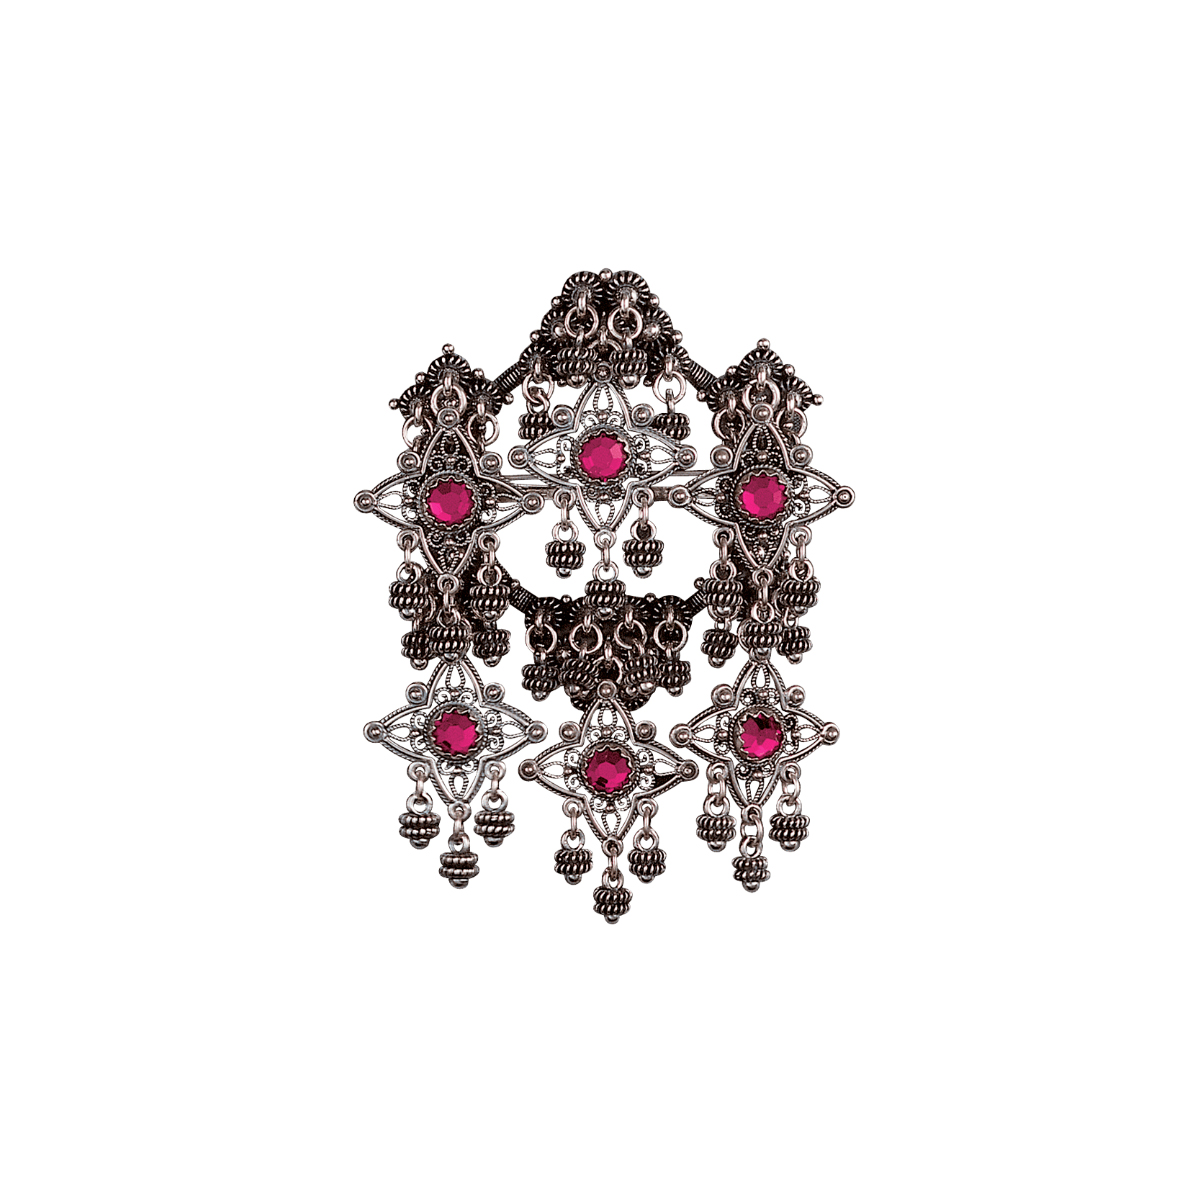 224110 - Sølje med rosa stein, oksidert